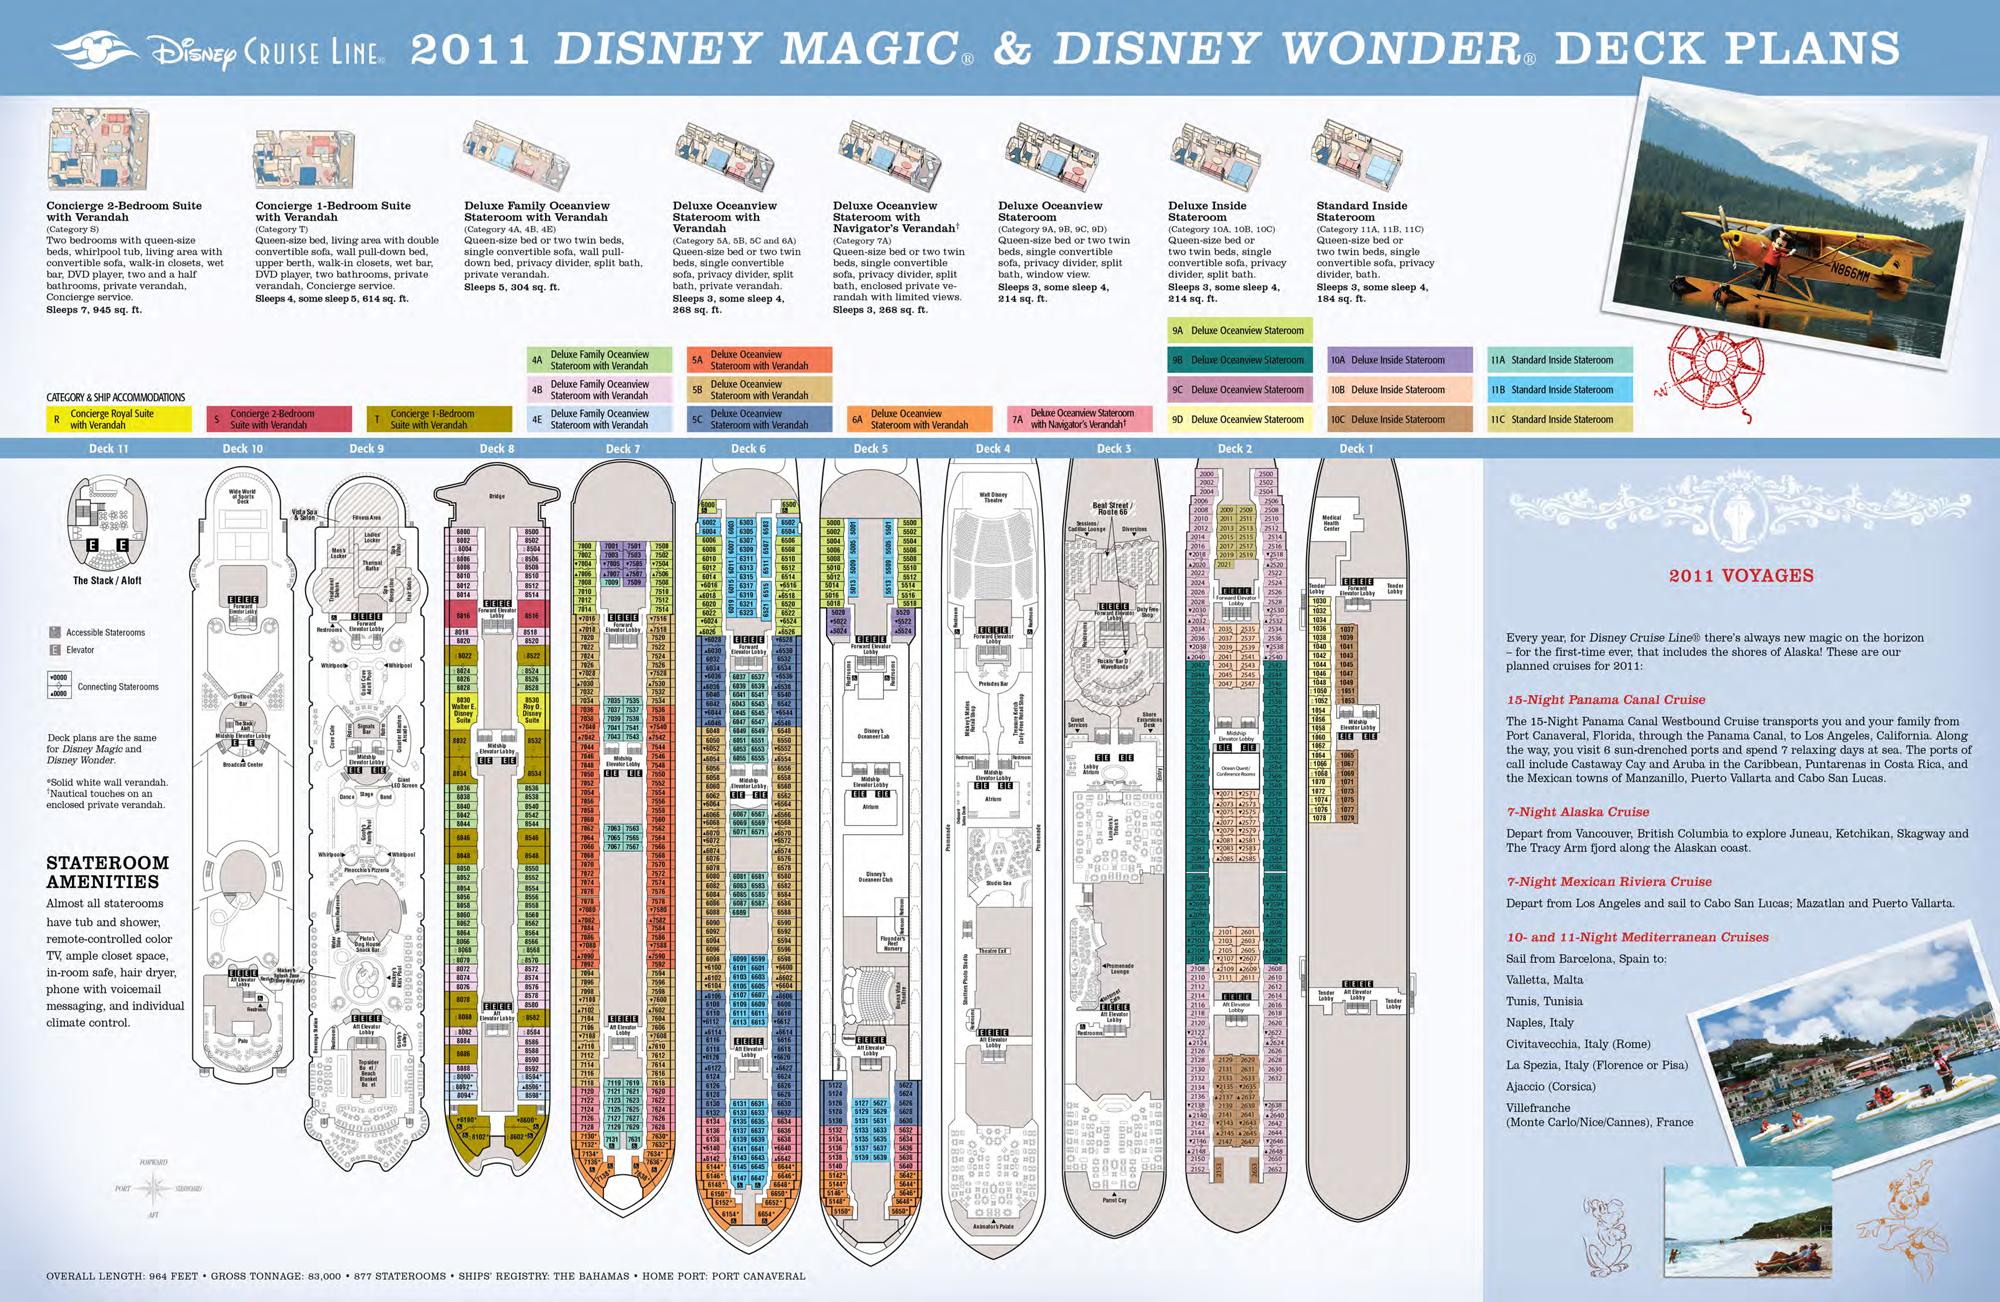 2011 Disney Cruise Deck Plans Mousemisers